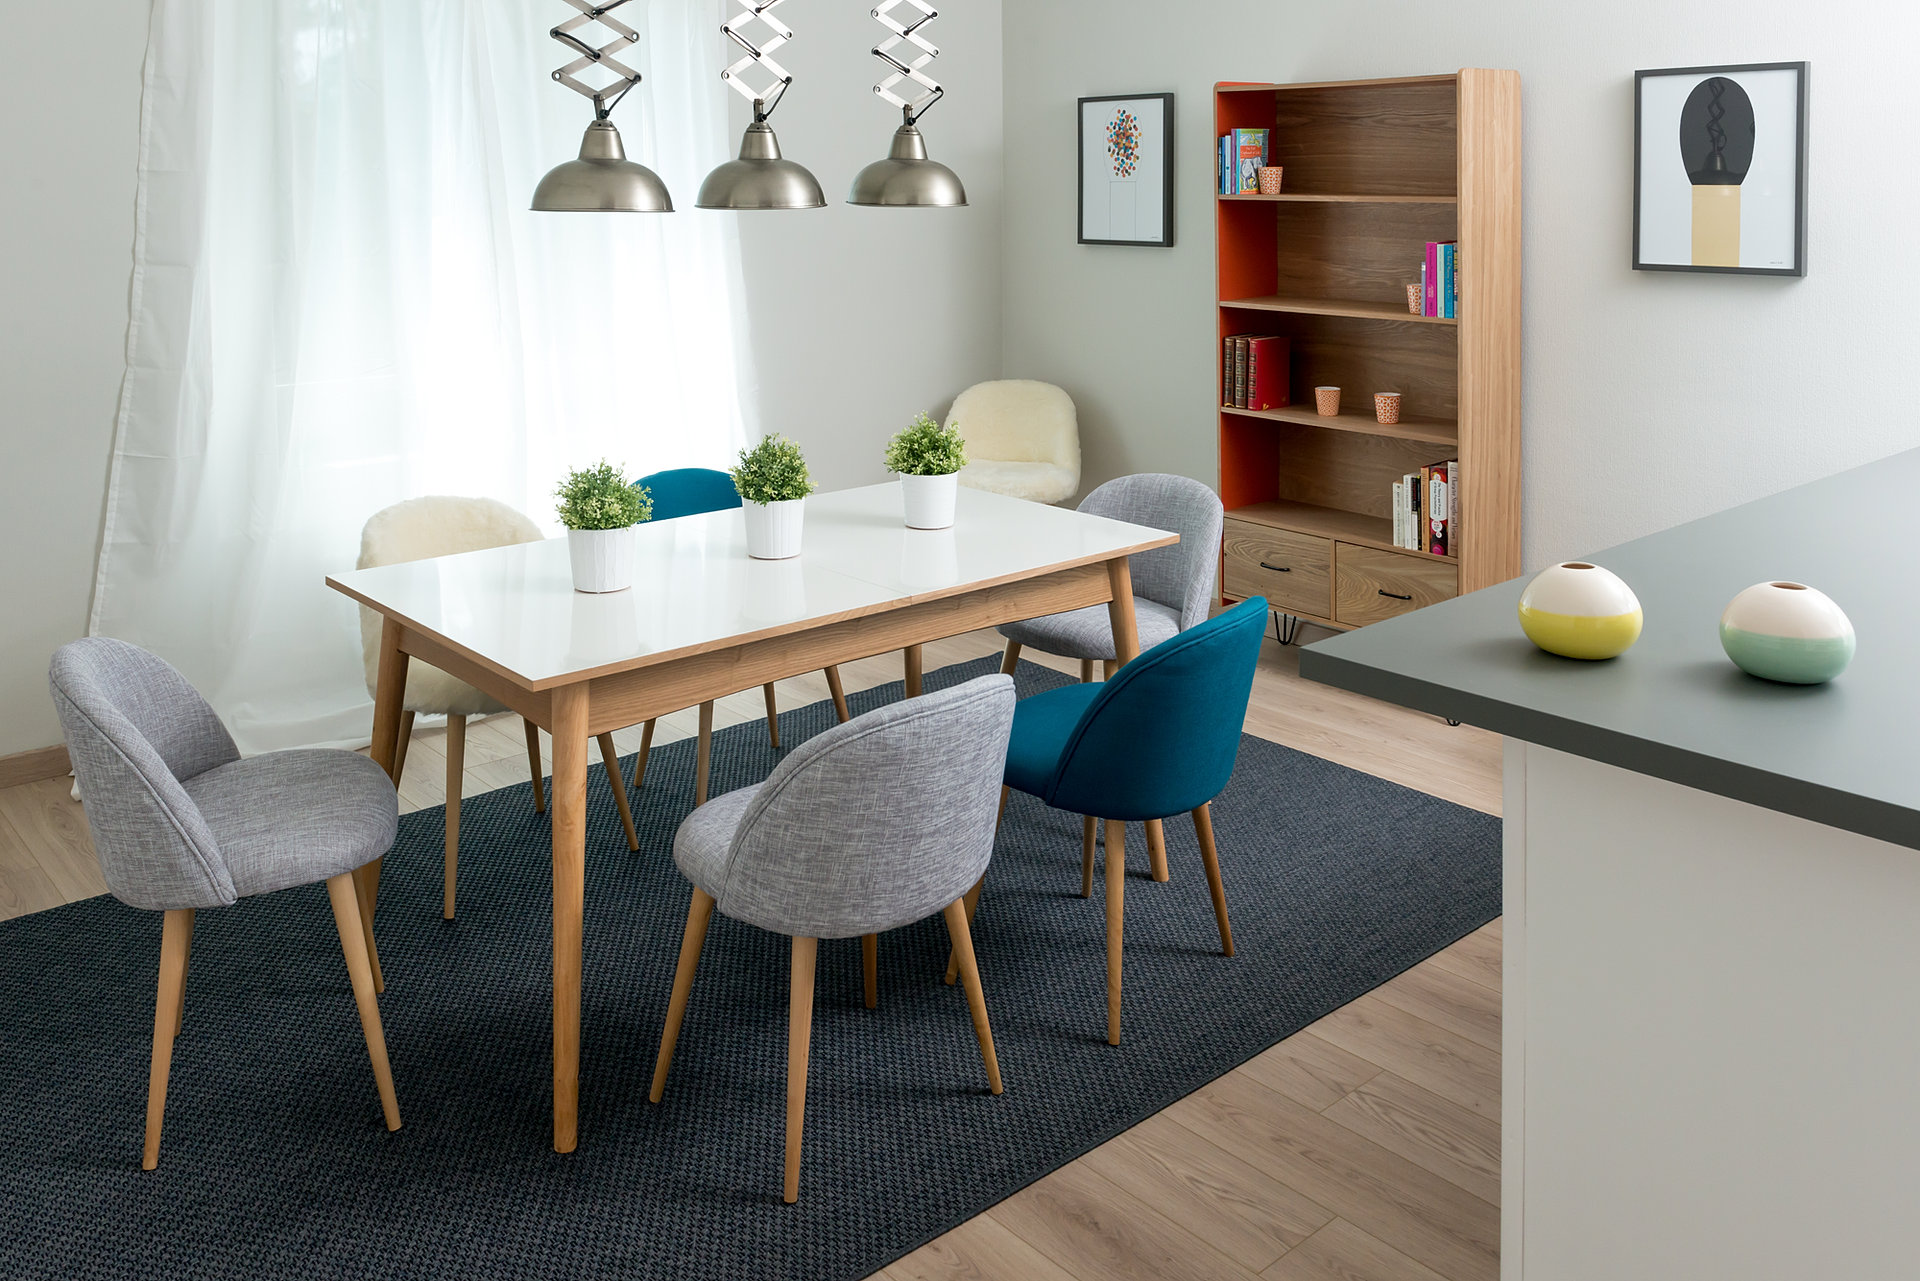 Mobilier - Acheter mobilier pas cher ...